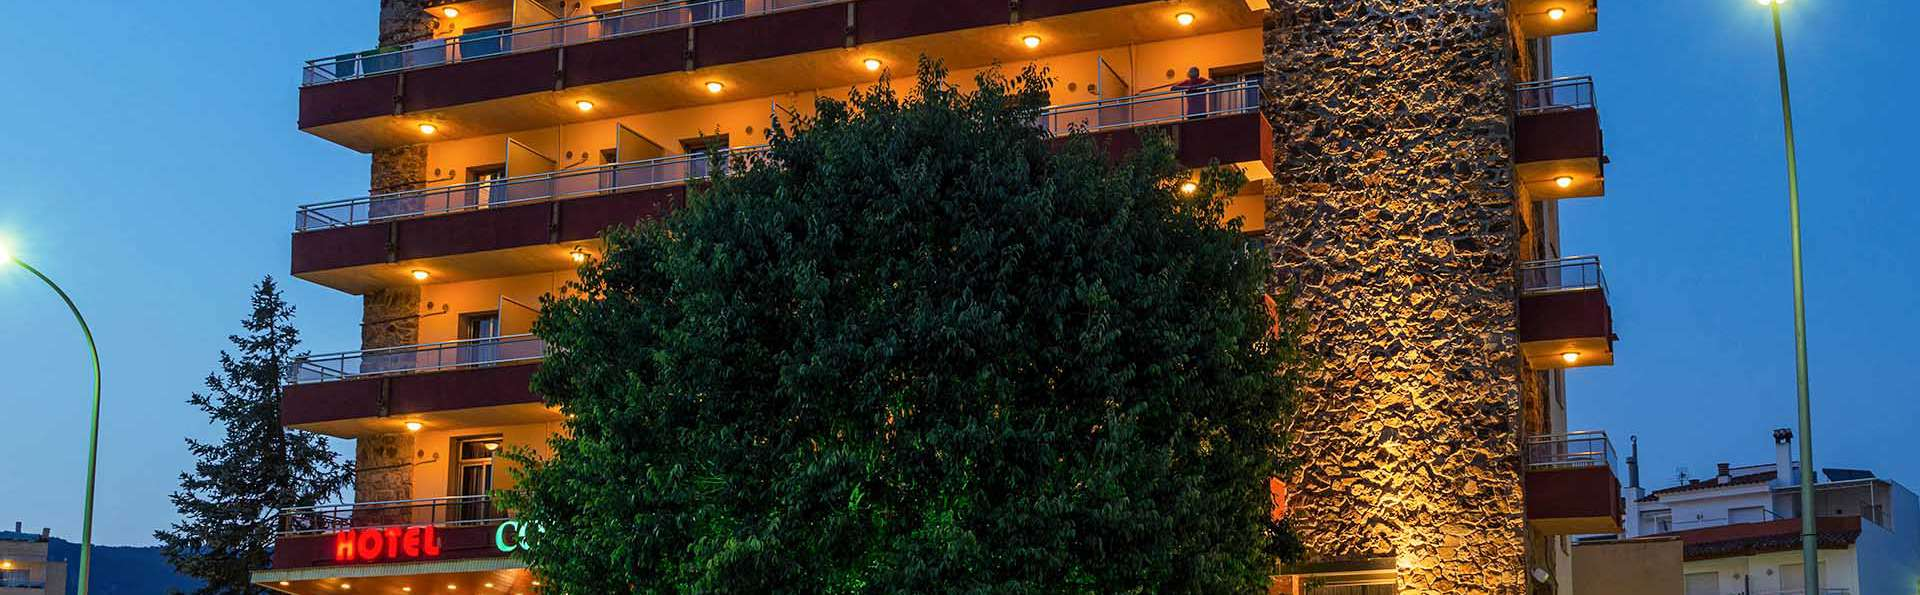 Hotel Continental Tossa - EDIT_EXTERIOR_01.jpg